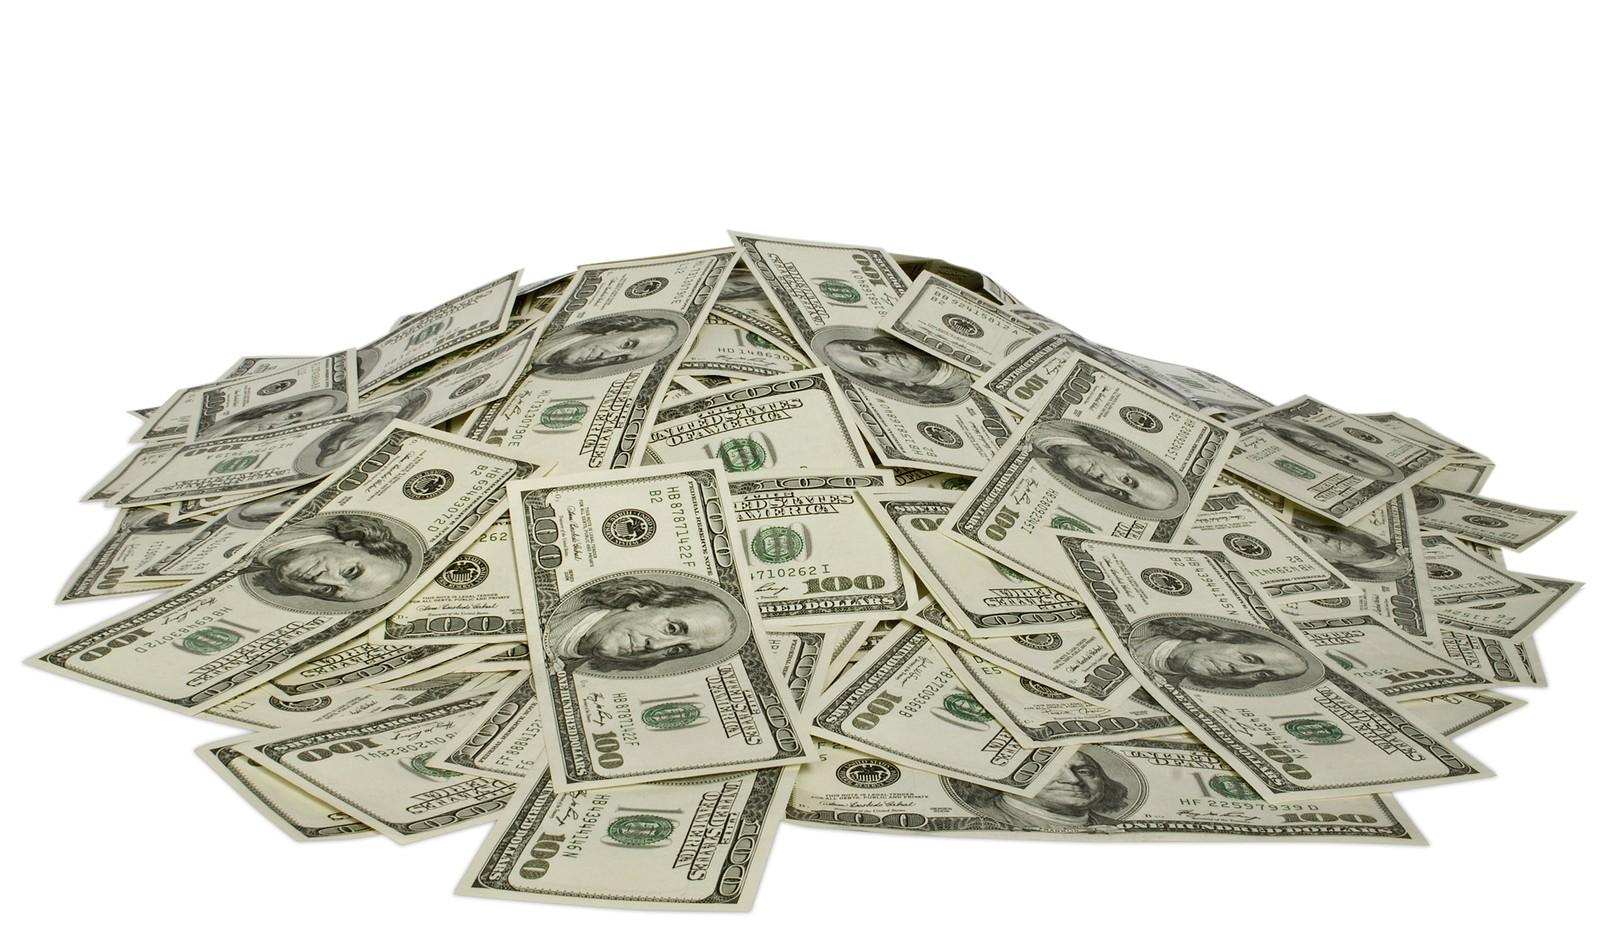 Pile of US Dollars